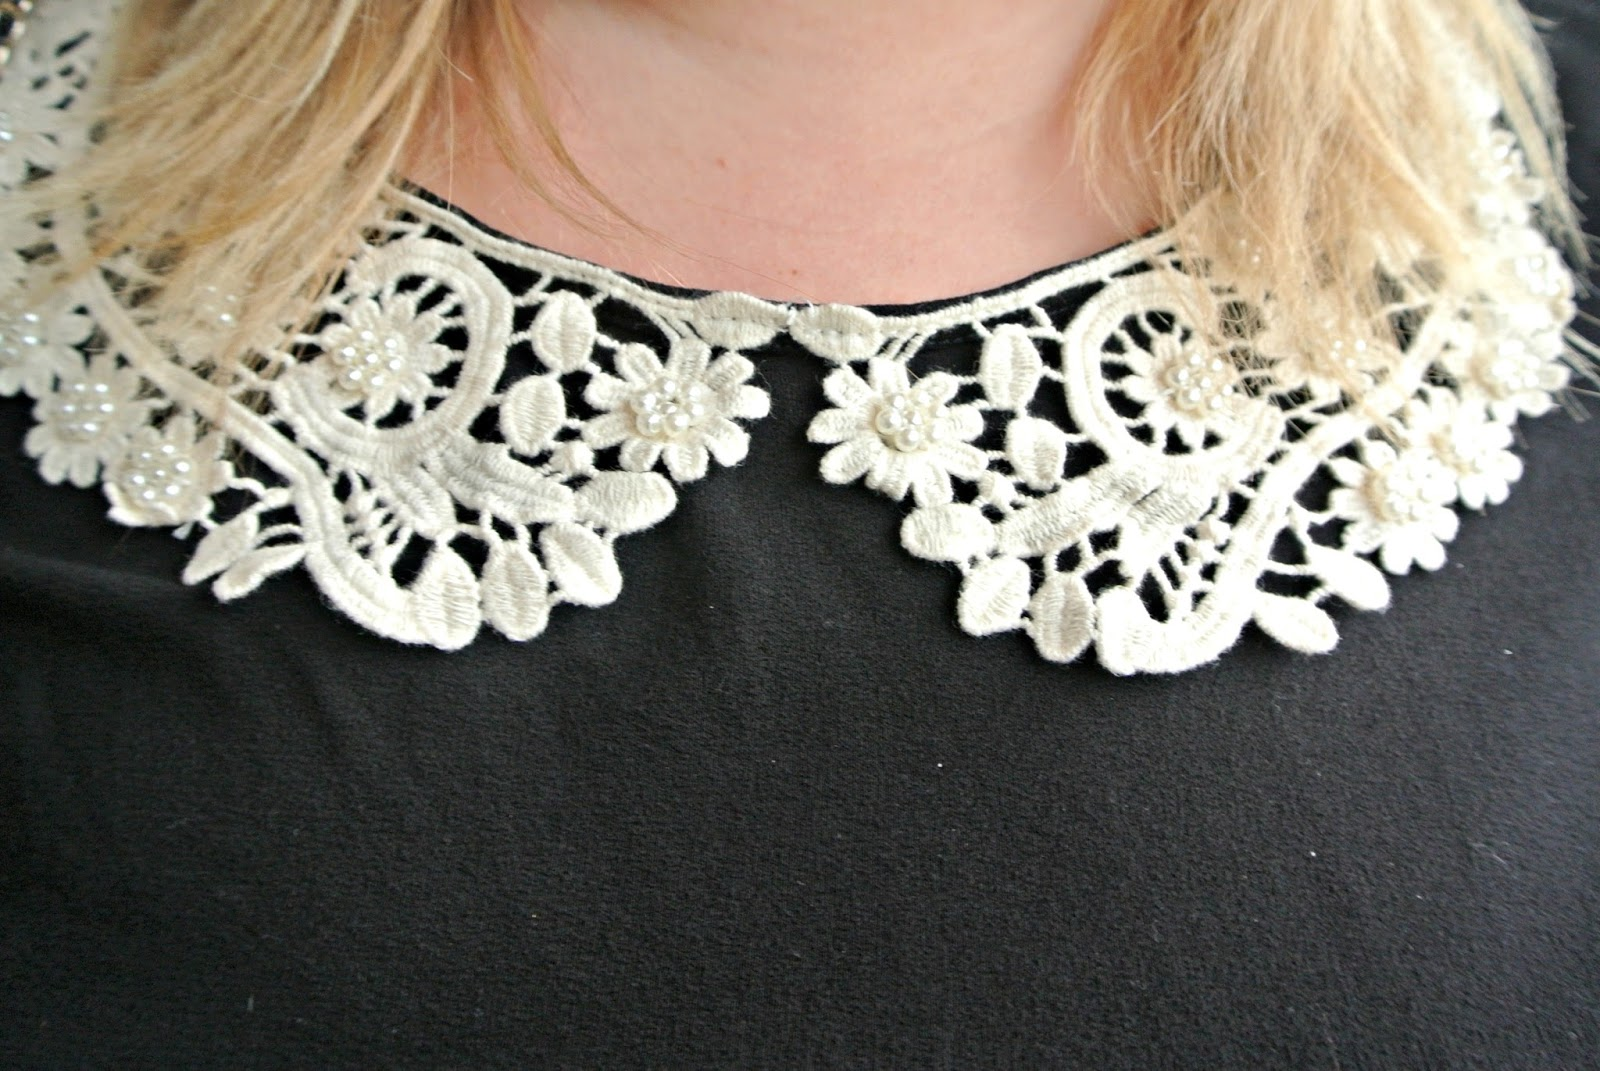 Scarlett and Jo Crochet Collar Fit and Flare Dress WhatLauraLoves Brand Ambassador